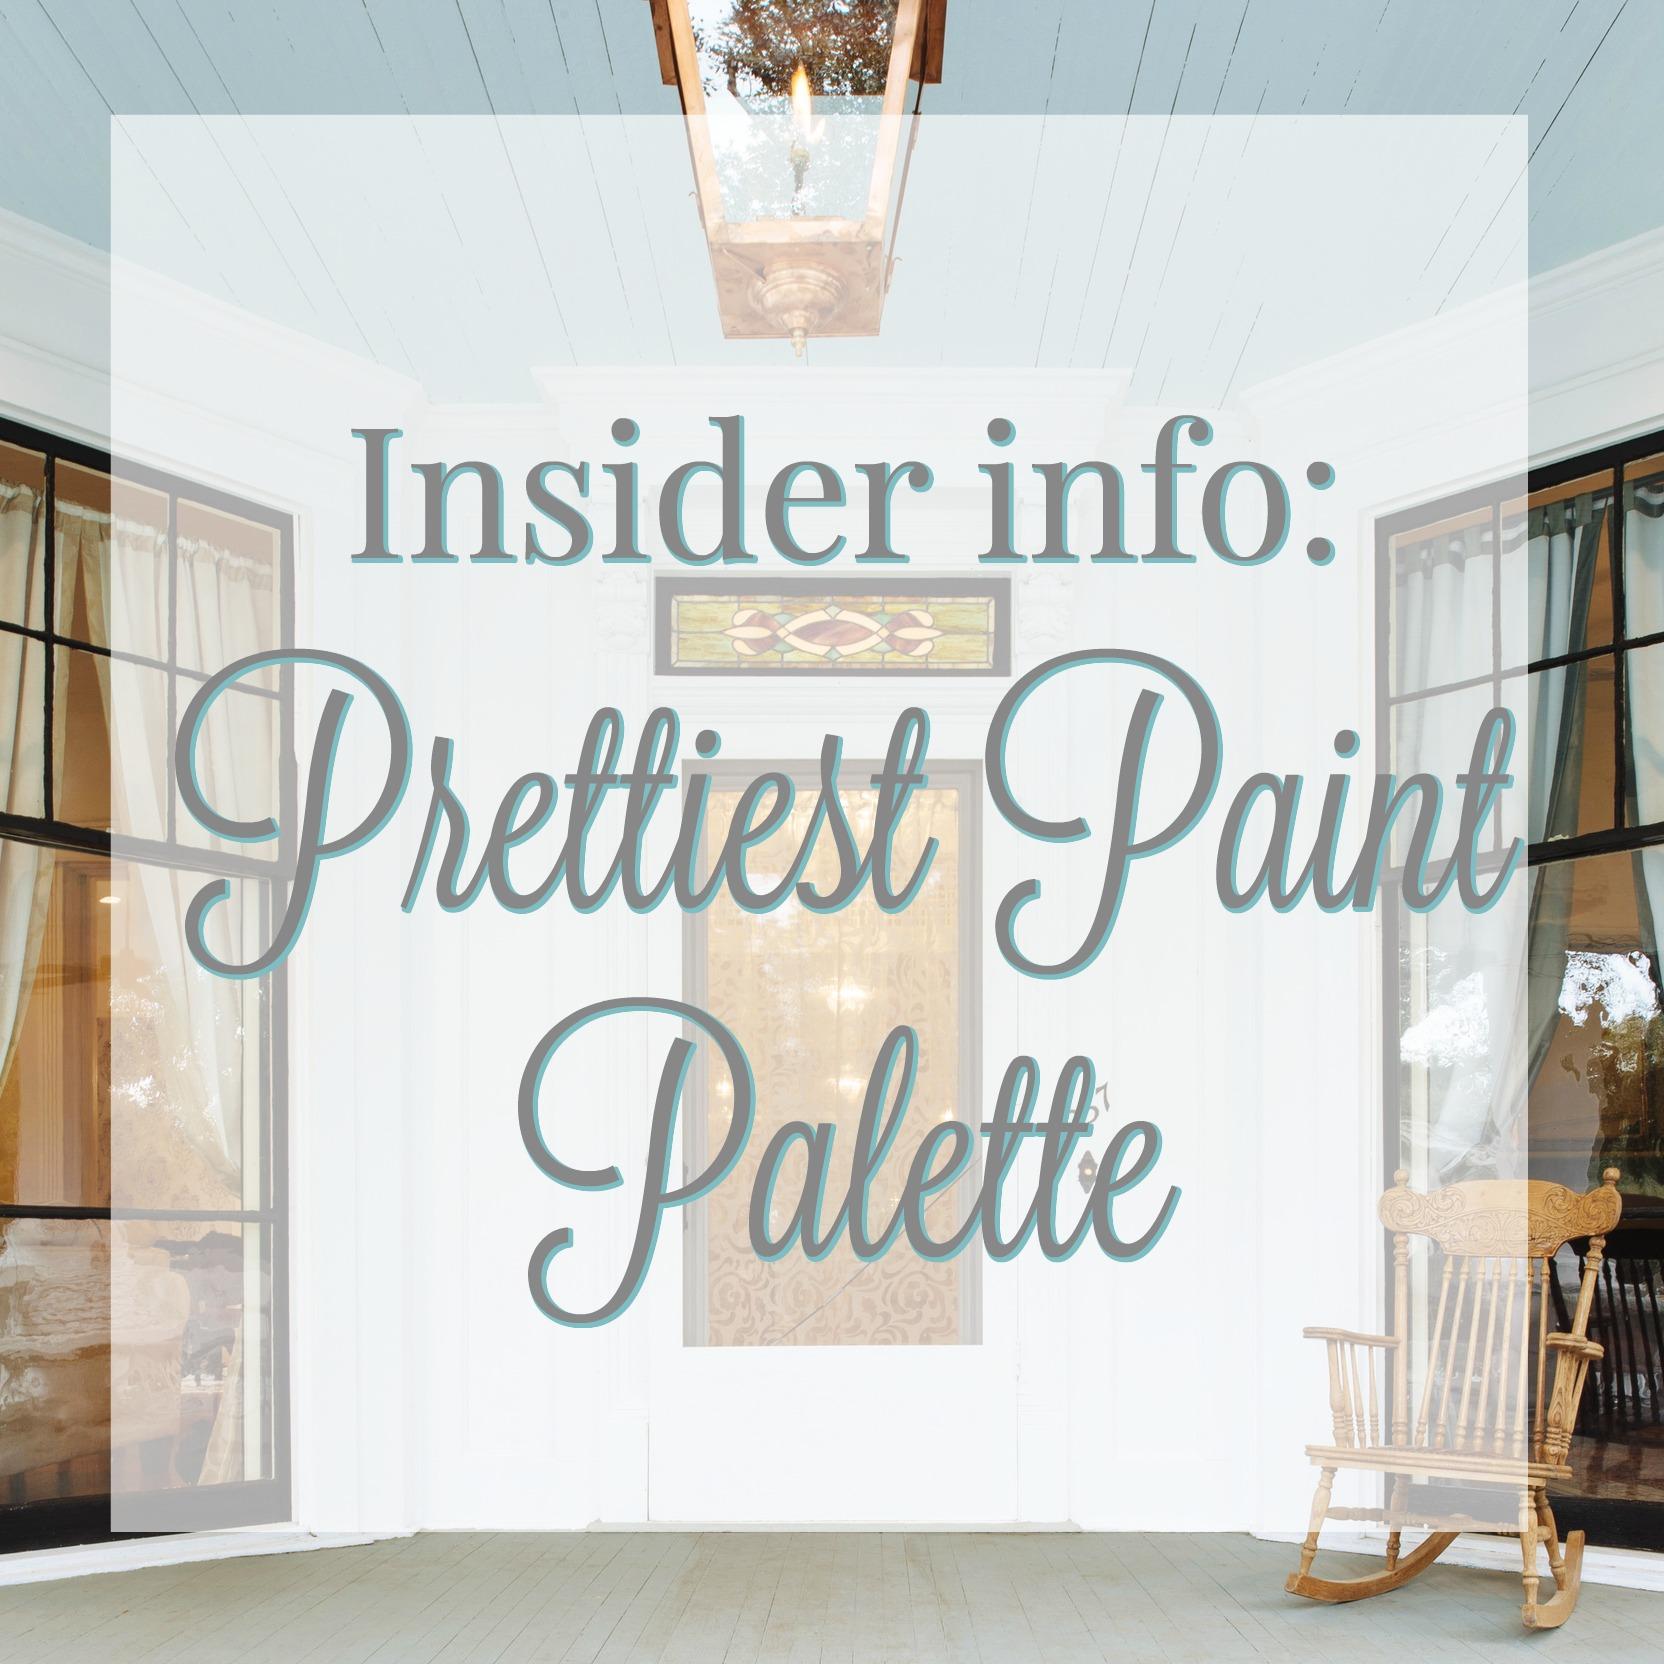 Southern Home Paint Color Palette - Fox Hollow Cottage